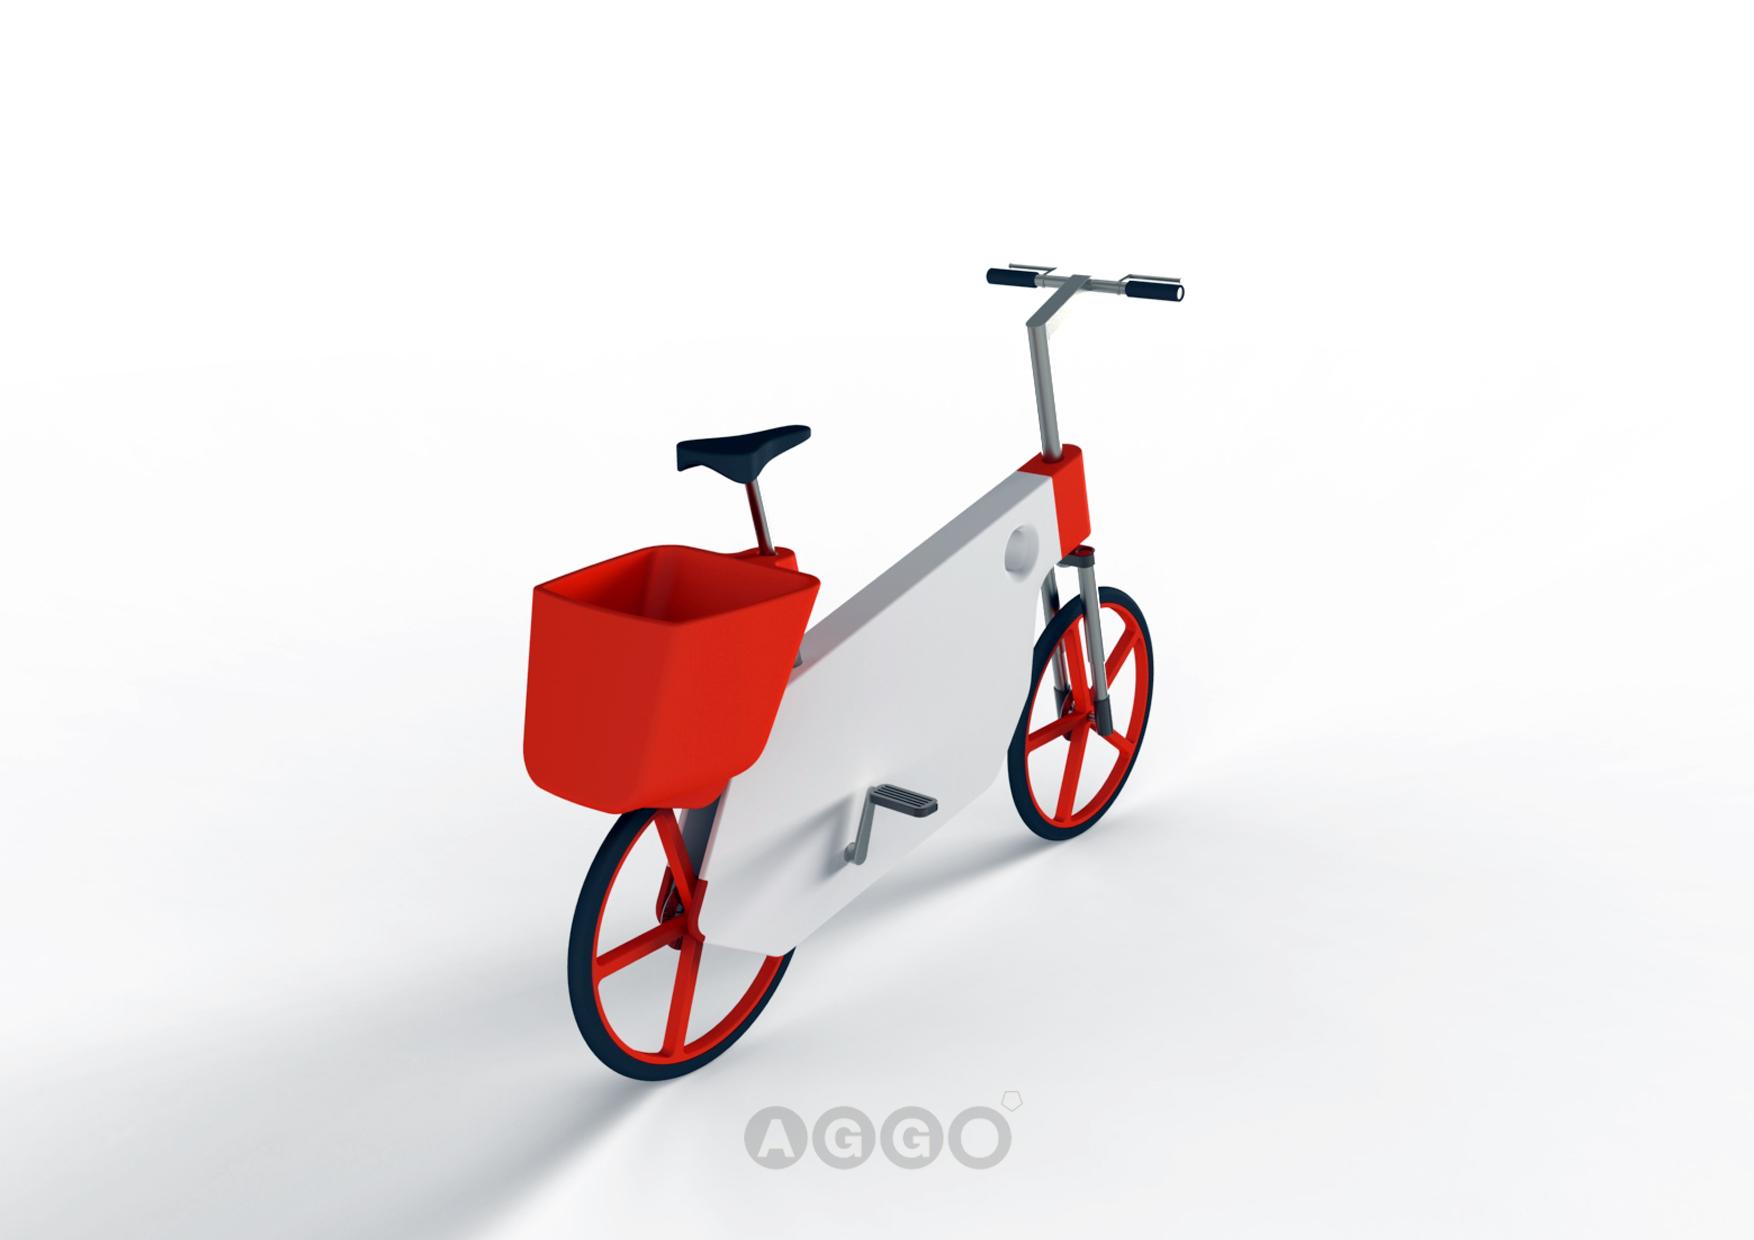 aggo_tesla_bike022.jpg